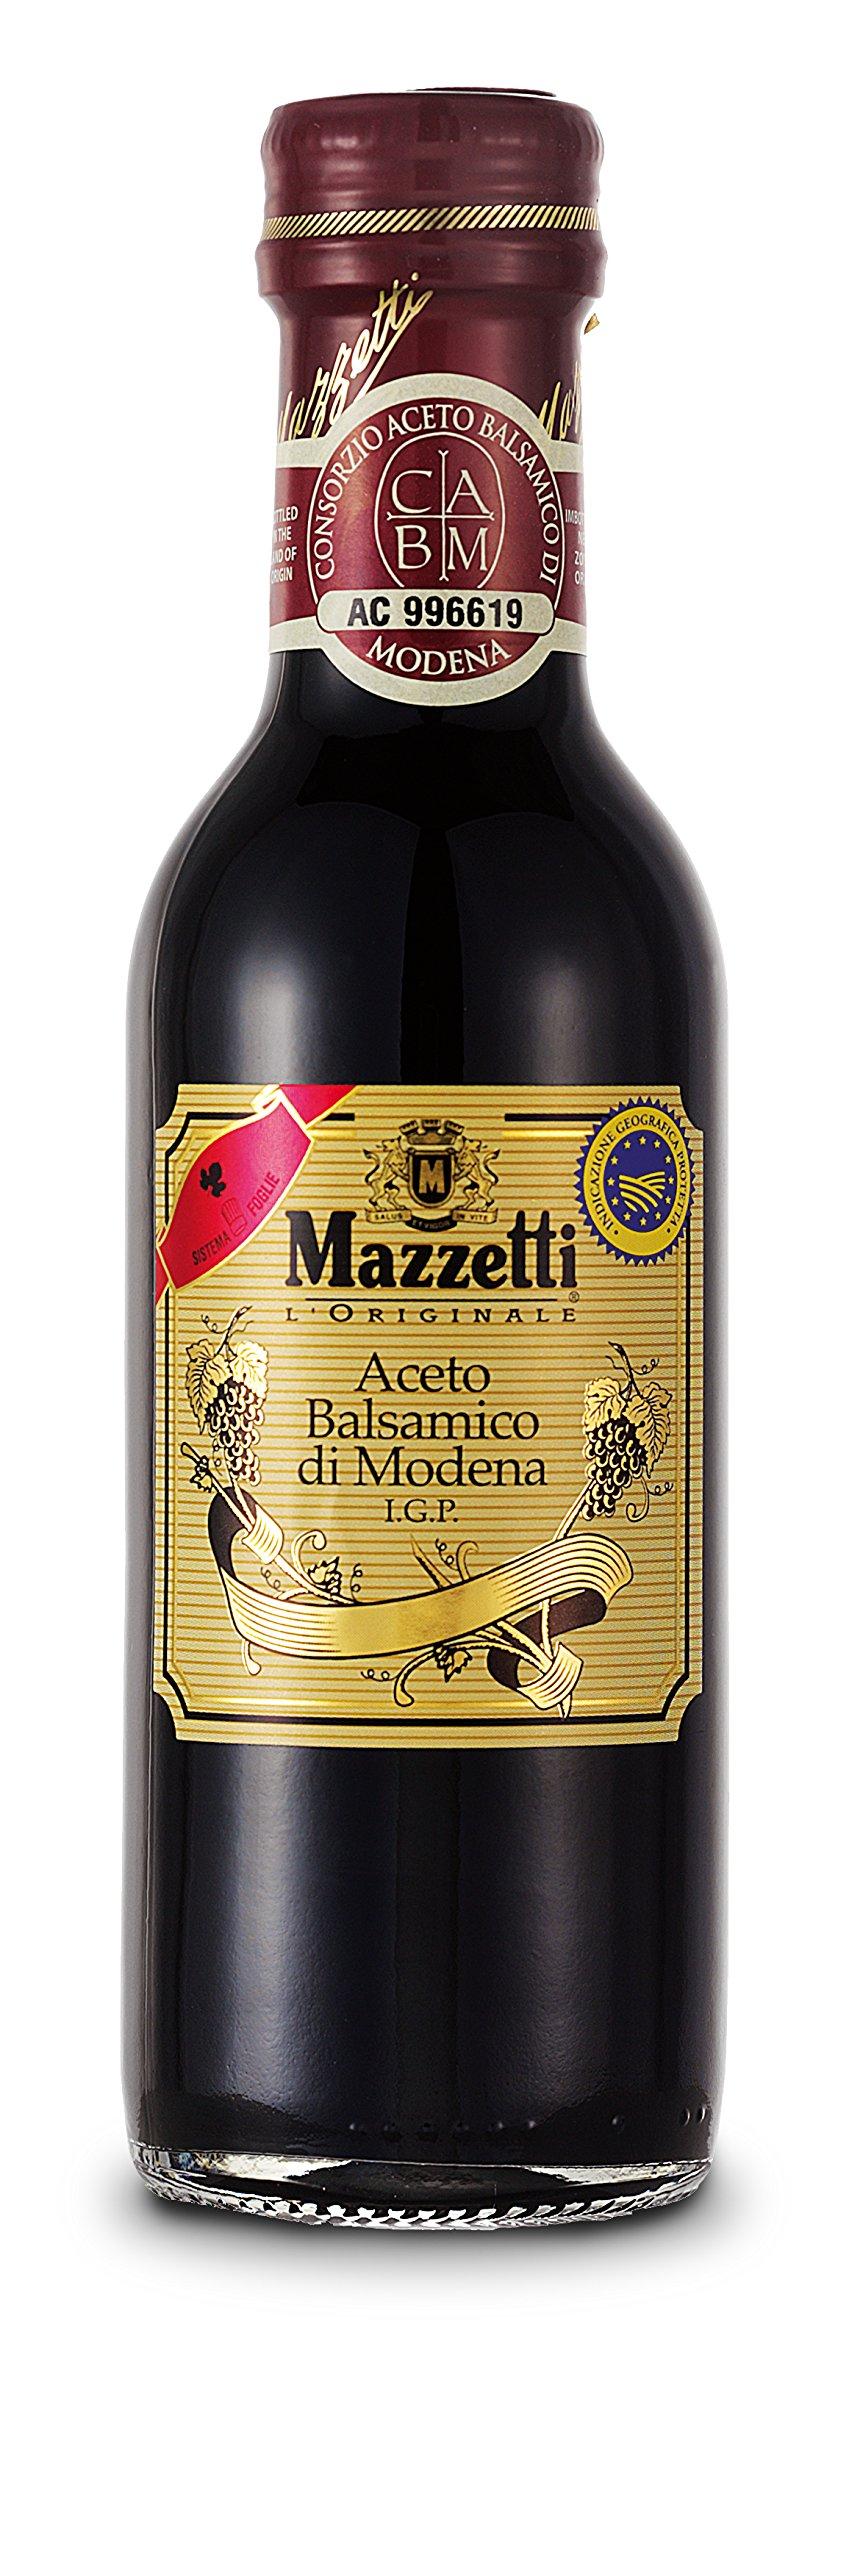 Mazzetti Aseto Balsamic Vinegar 250ml 1 Mazzetti Balsamic Vinegar Of Modena 6% acidity with pop up pourer.